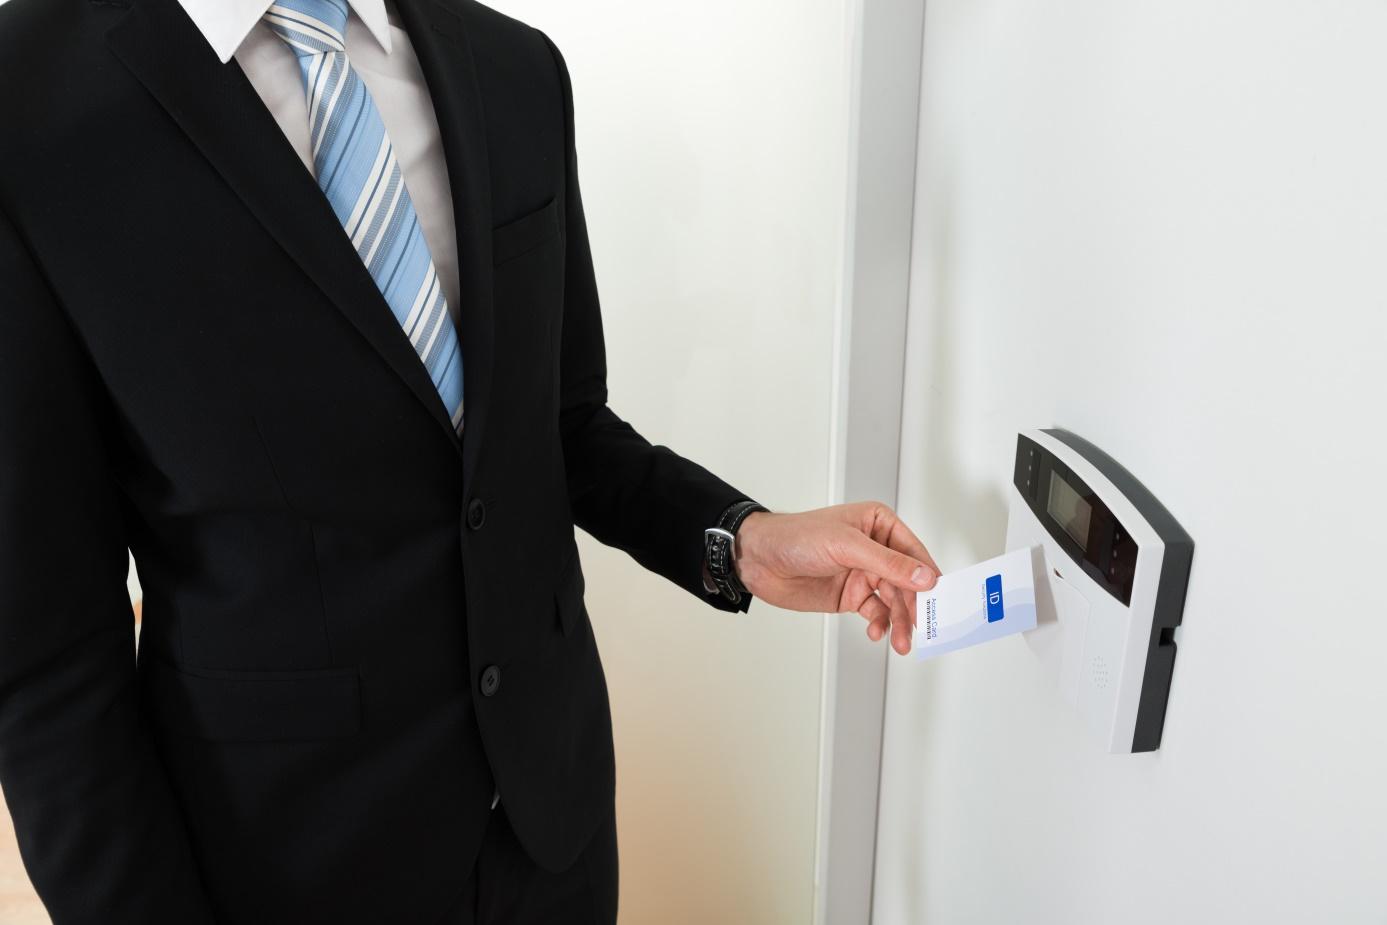 controle-acces-entreprise-carte-rfid-etui-protection